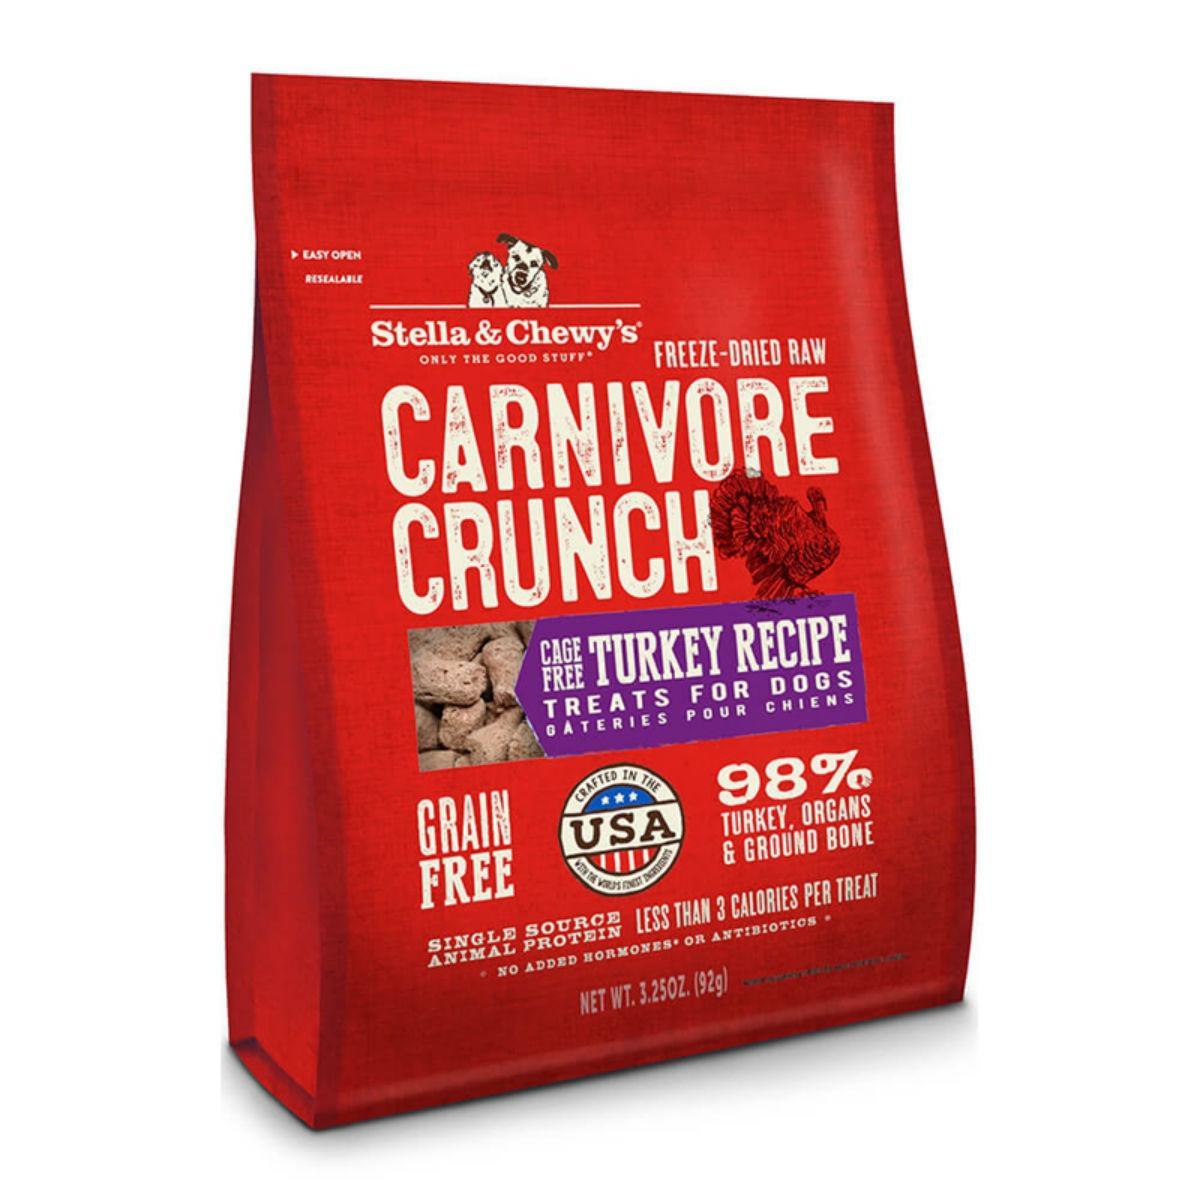 Stella & Chewy's Carnivore Crunch Dog Treats - Turkey